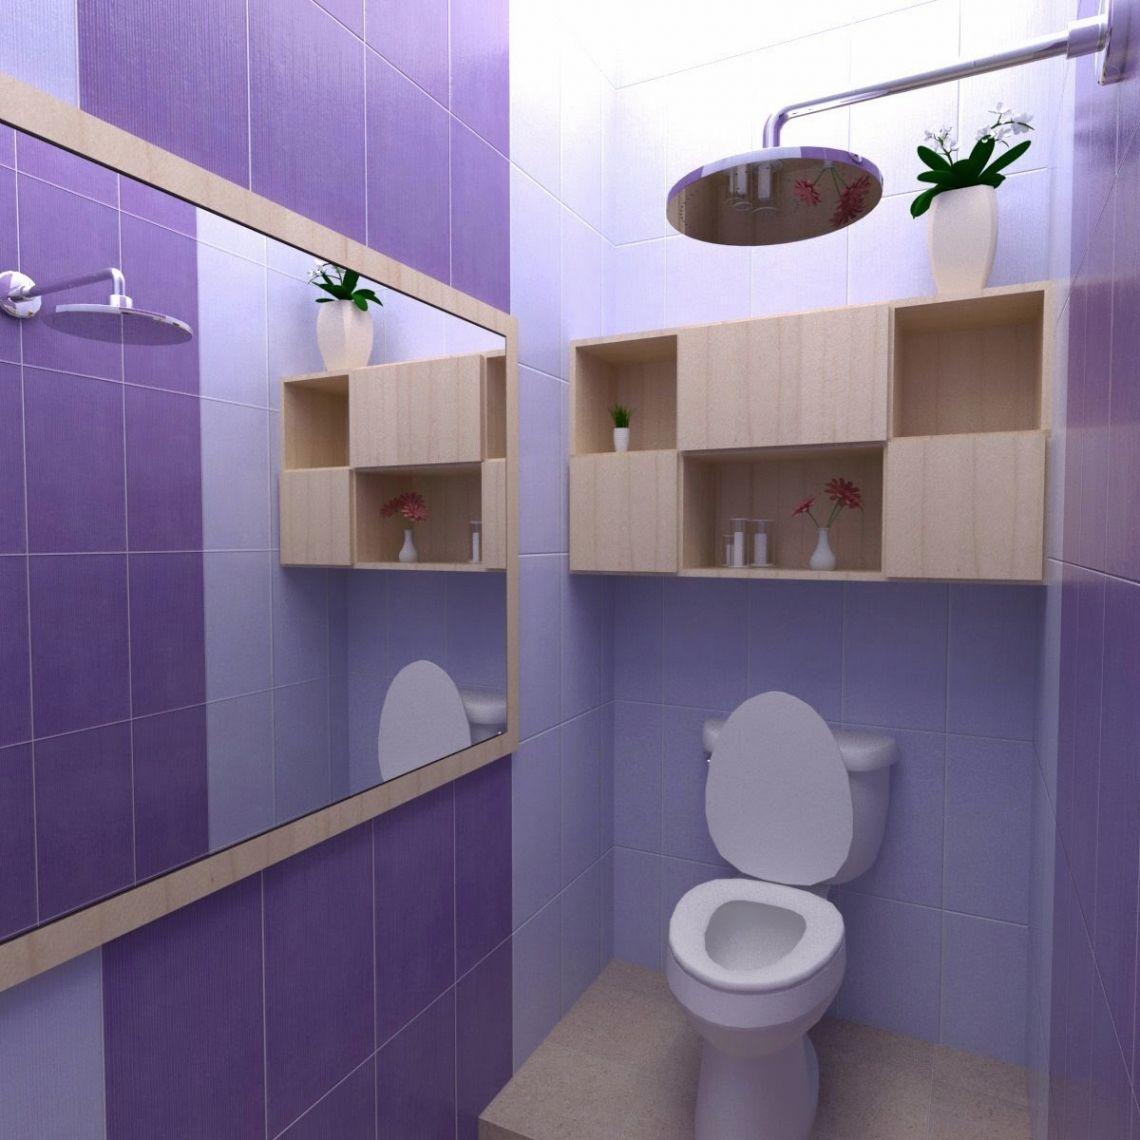 Model keramik kamar mandi minimalis modern model keramik kamar mandi - Warna Keramik Kamar Mandi Kamar Mandi Minimalis Yang Berkaitan Dengan Warna Keramik Kamar Mandi